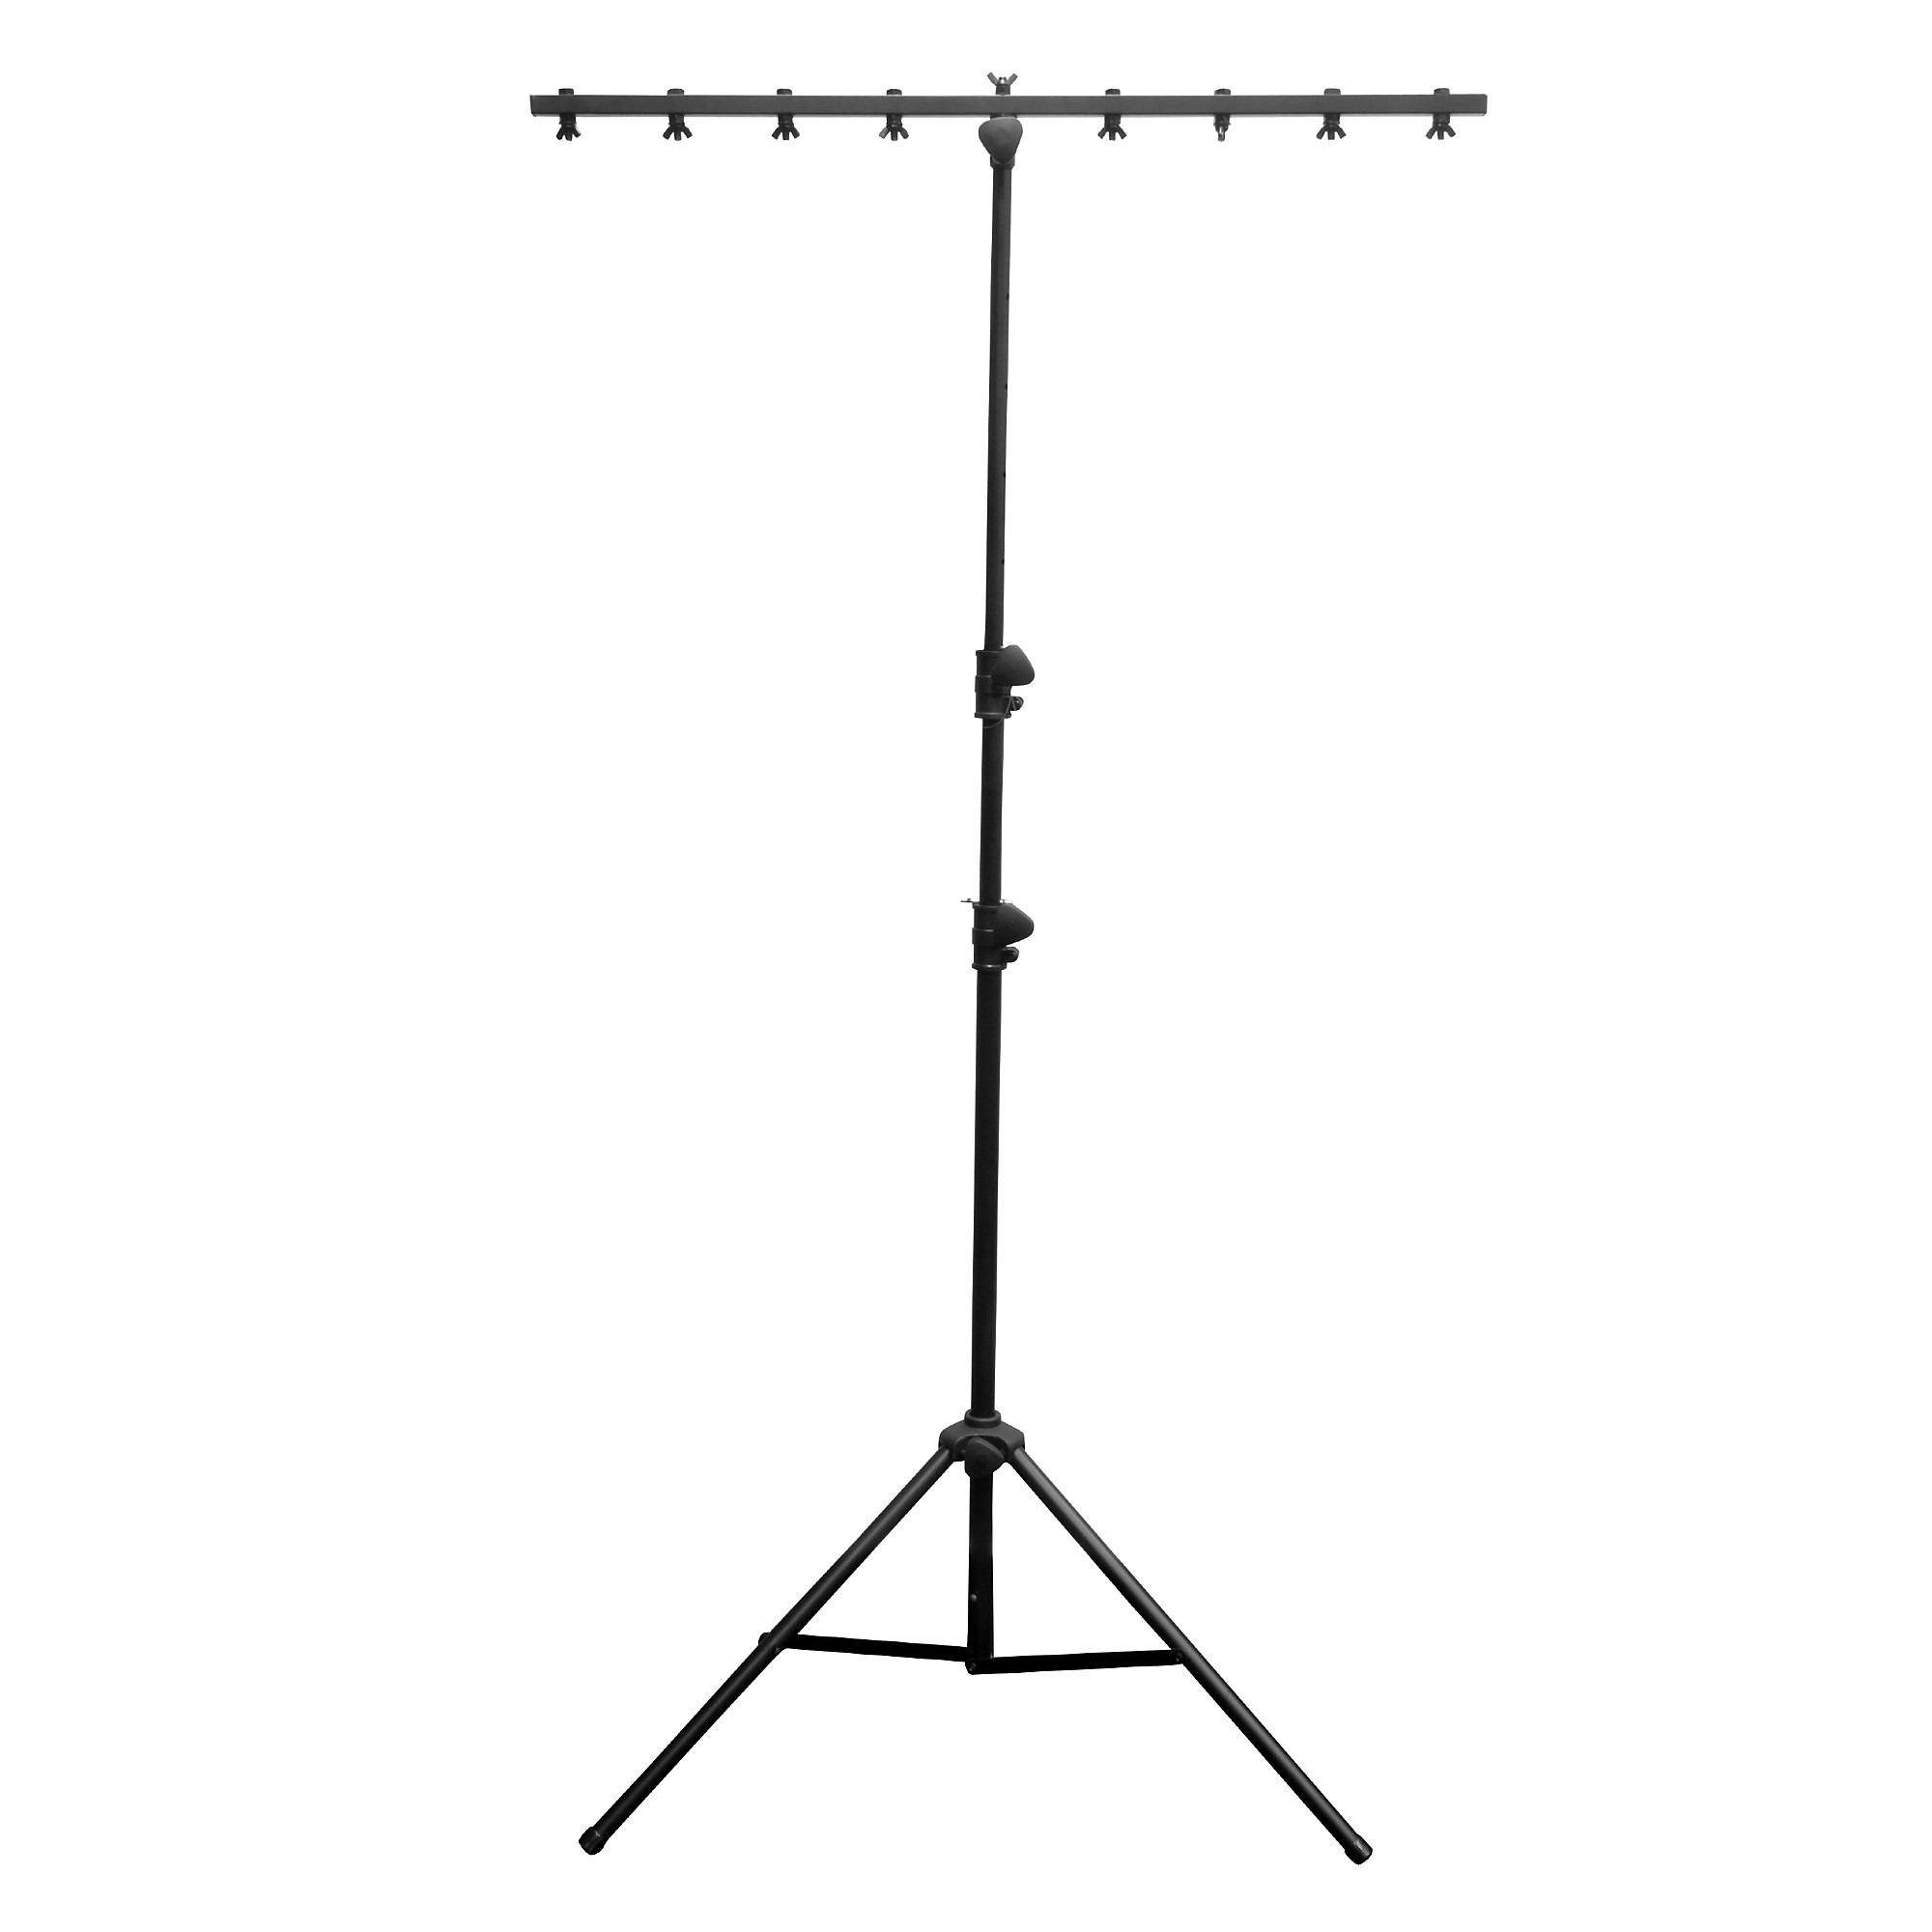 CH06 Lightweight Lighting Stand with T-Bar